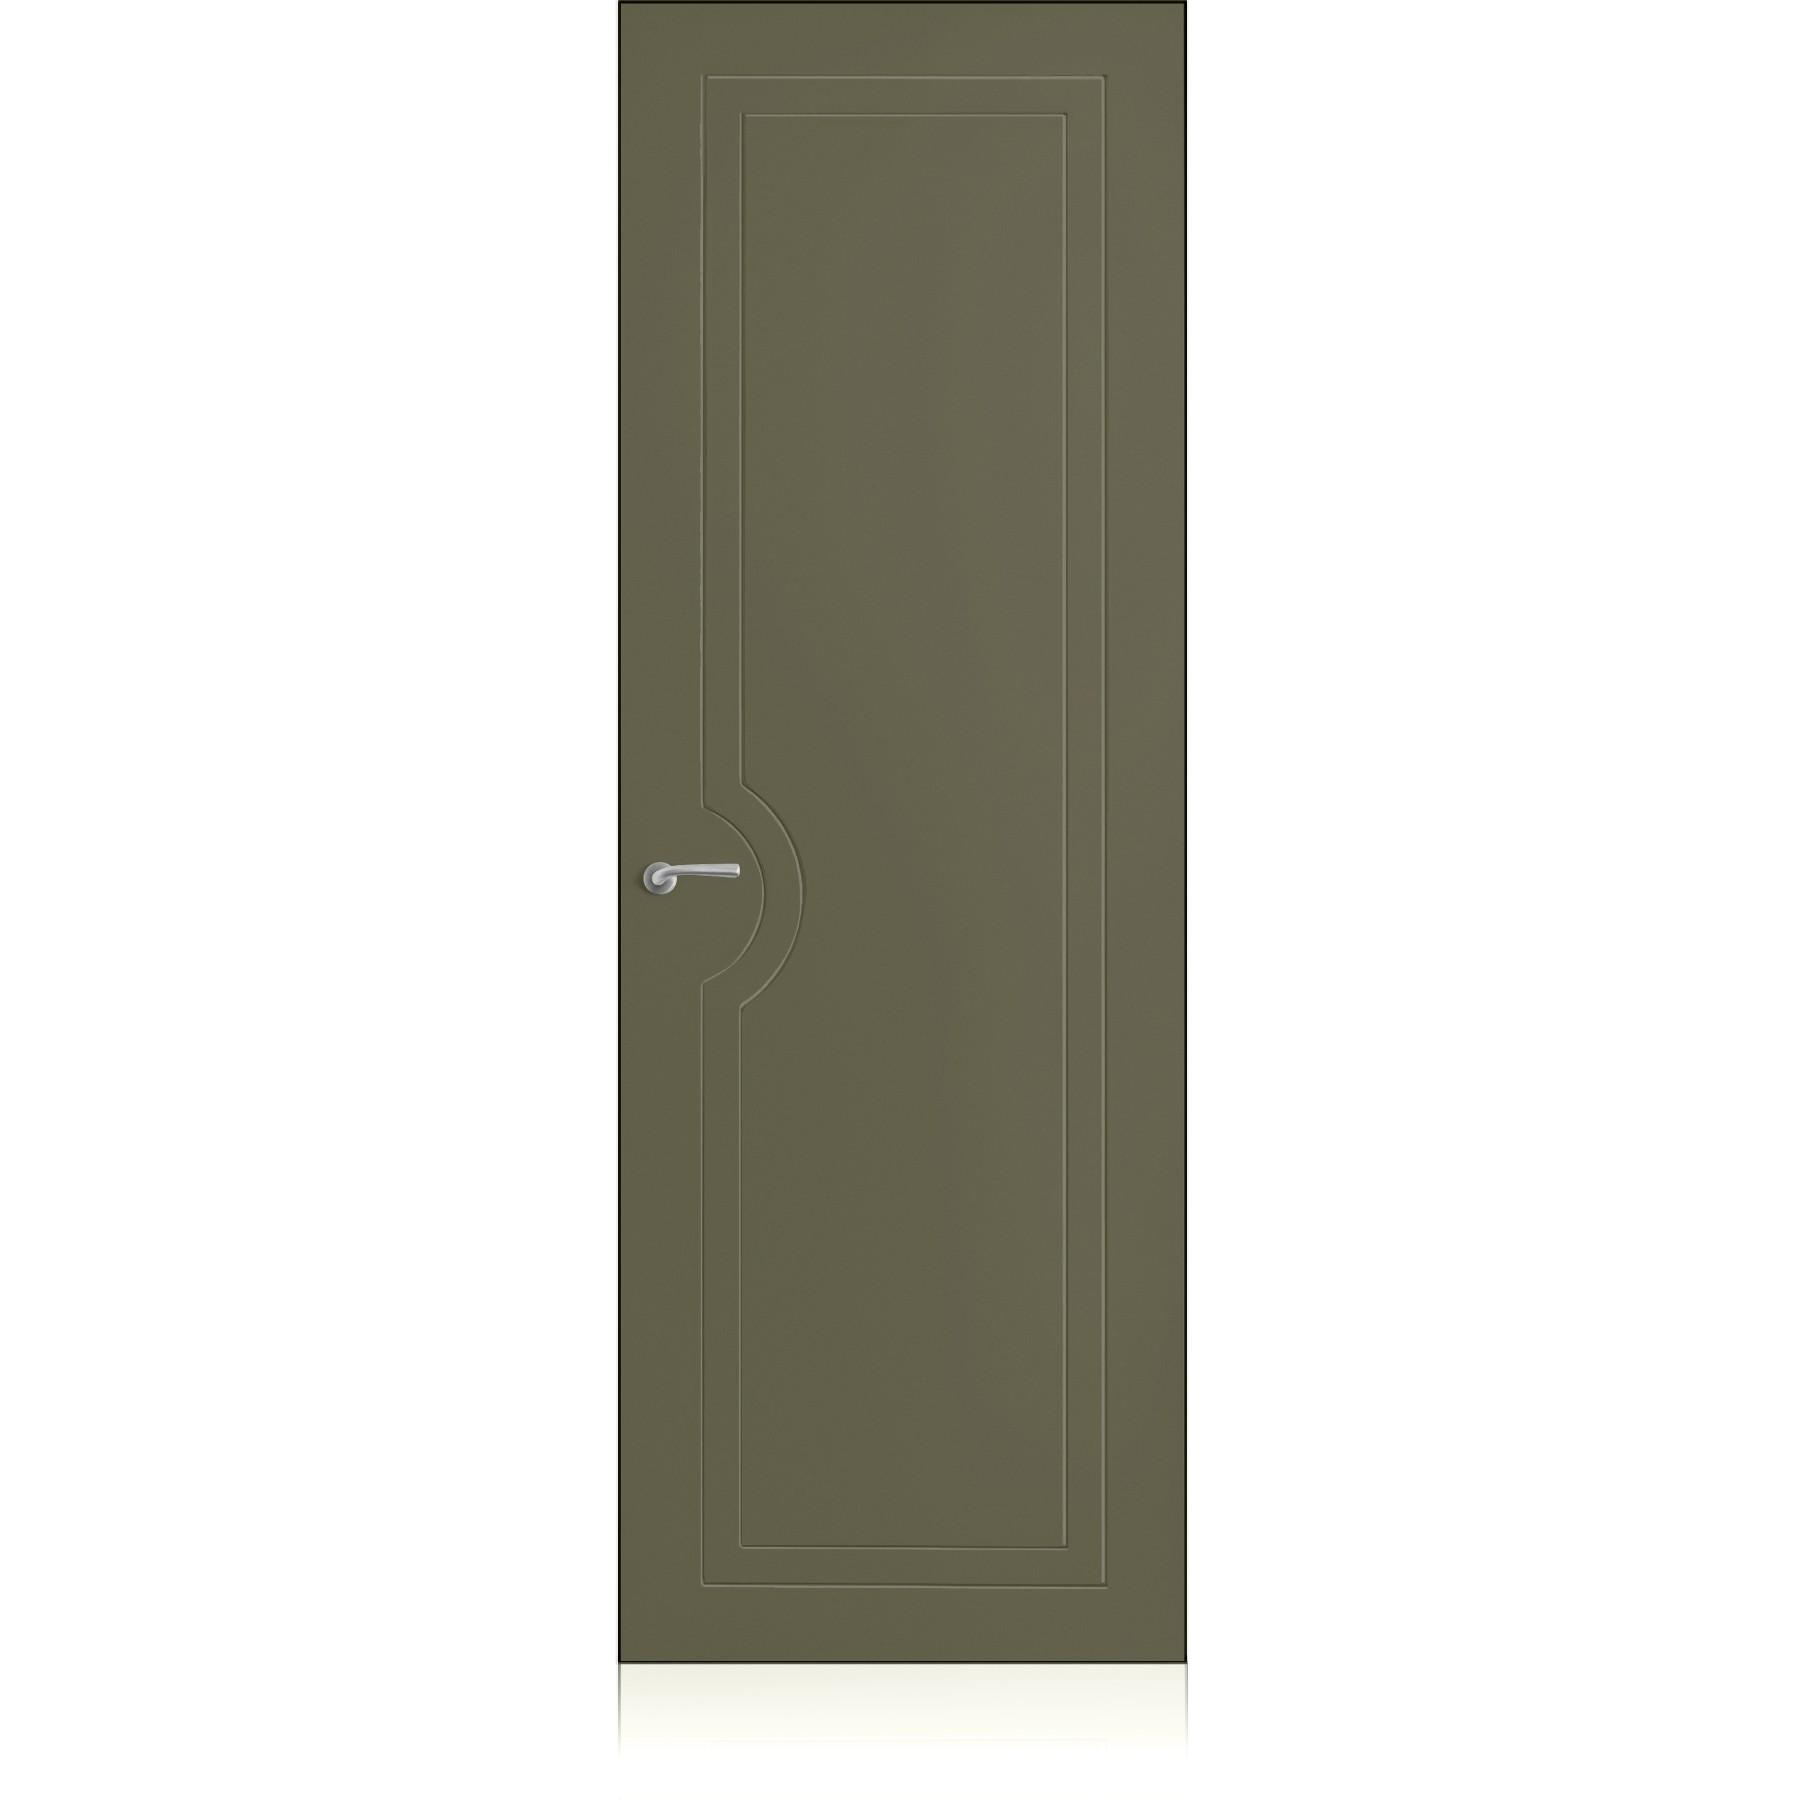 Yncisa/1 Zero Oliva Light Laccato ULTRAopaco door